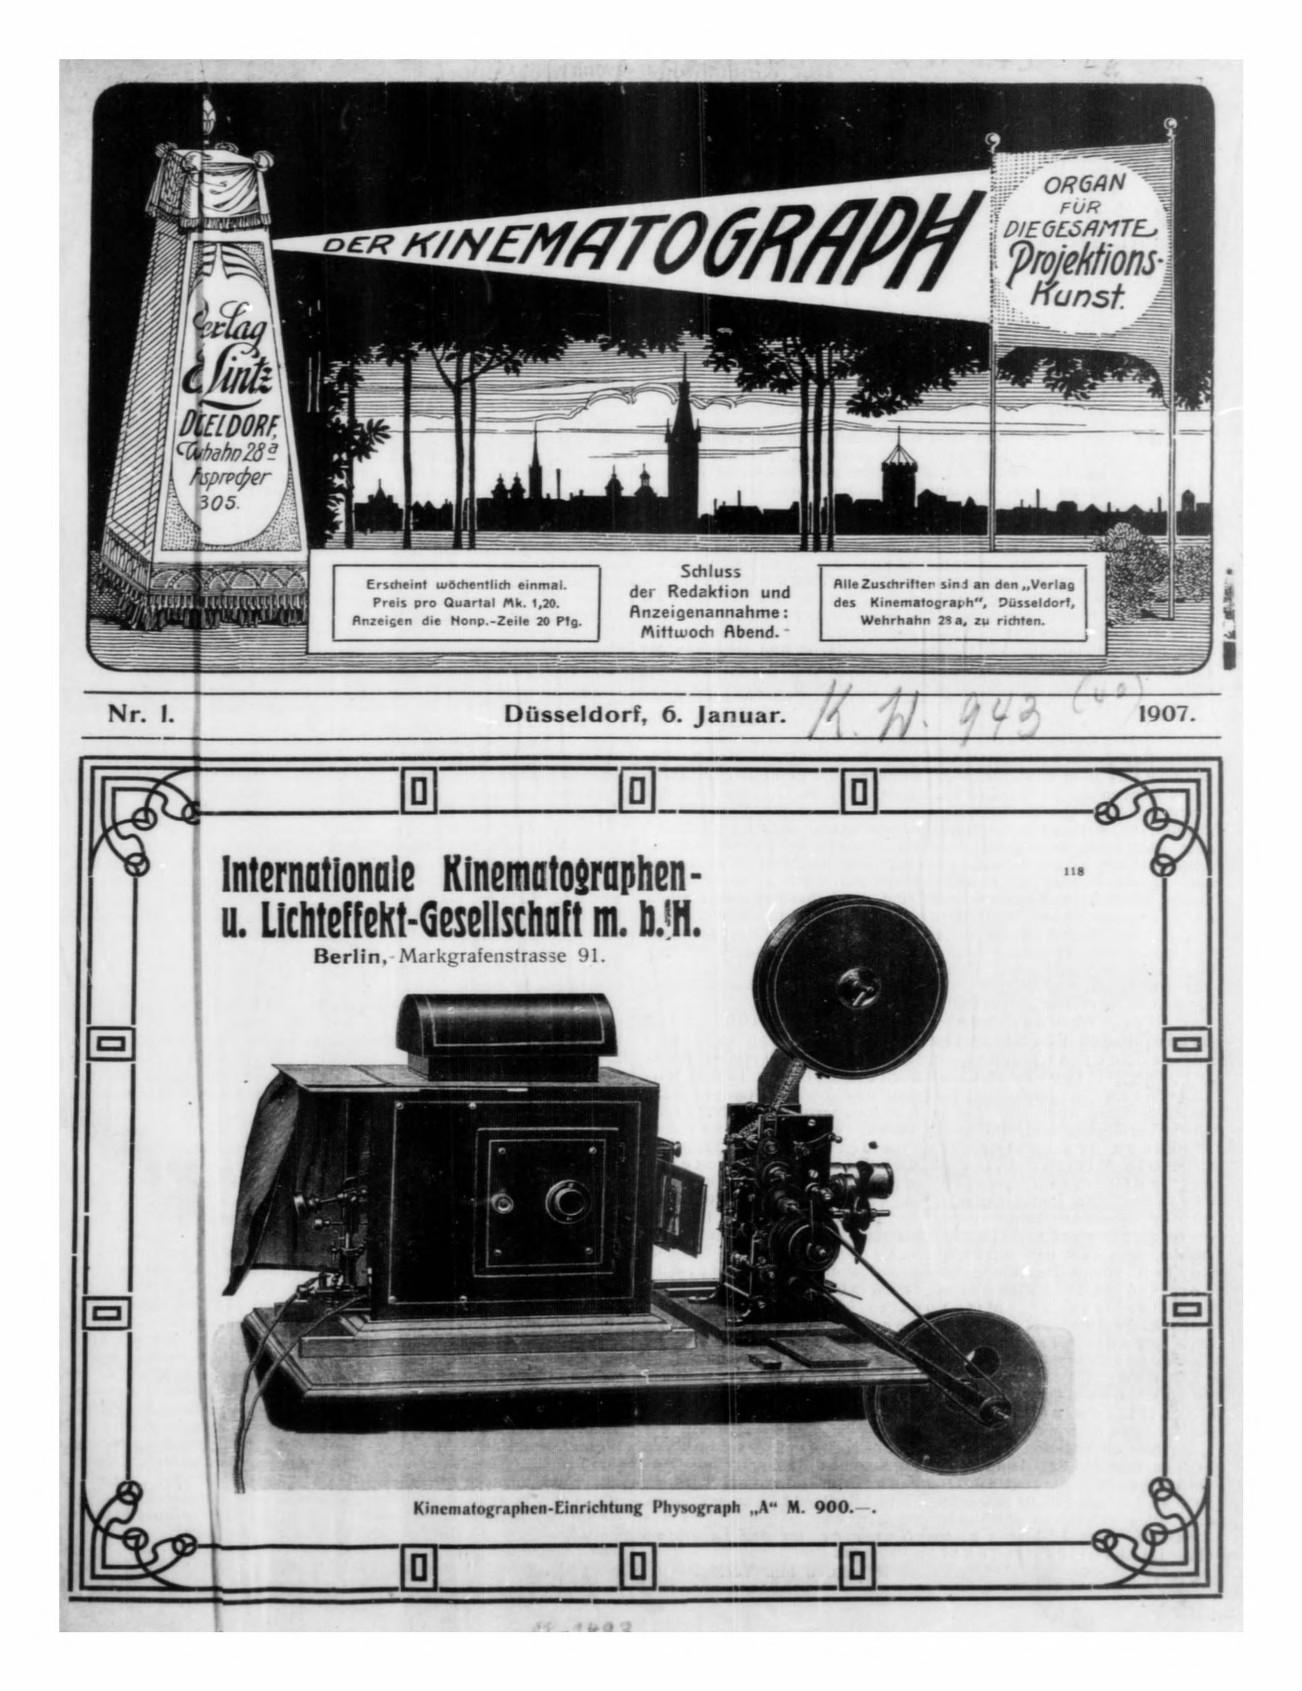 Kinematograph01-1907-01_jp2.zip&file=kinematograph01-1907-01_jp2%2fkinematograph01-1907-01_0000